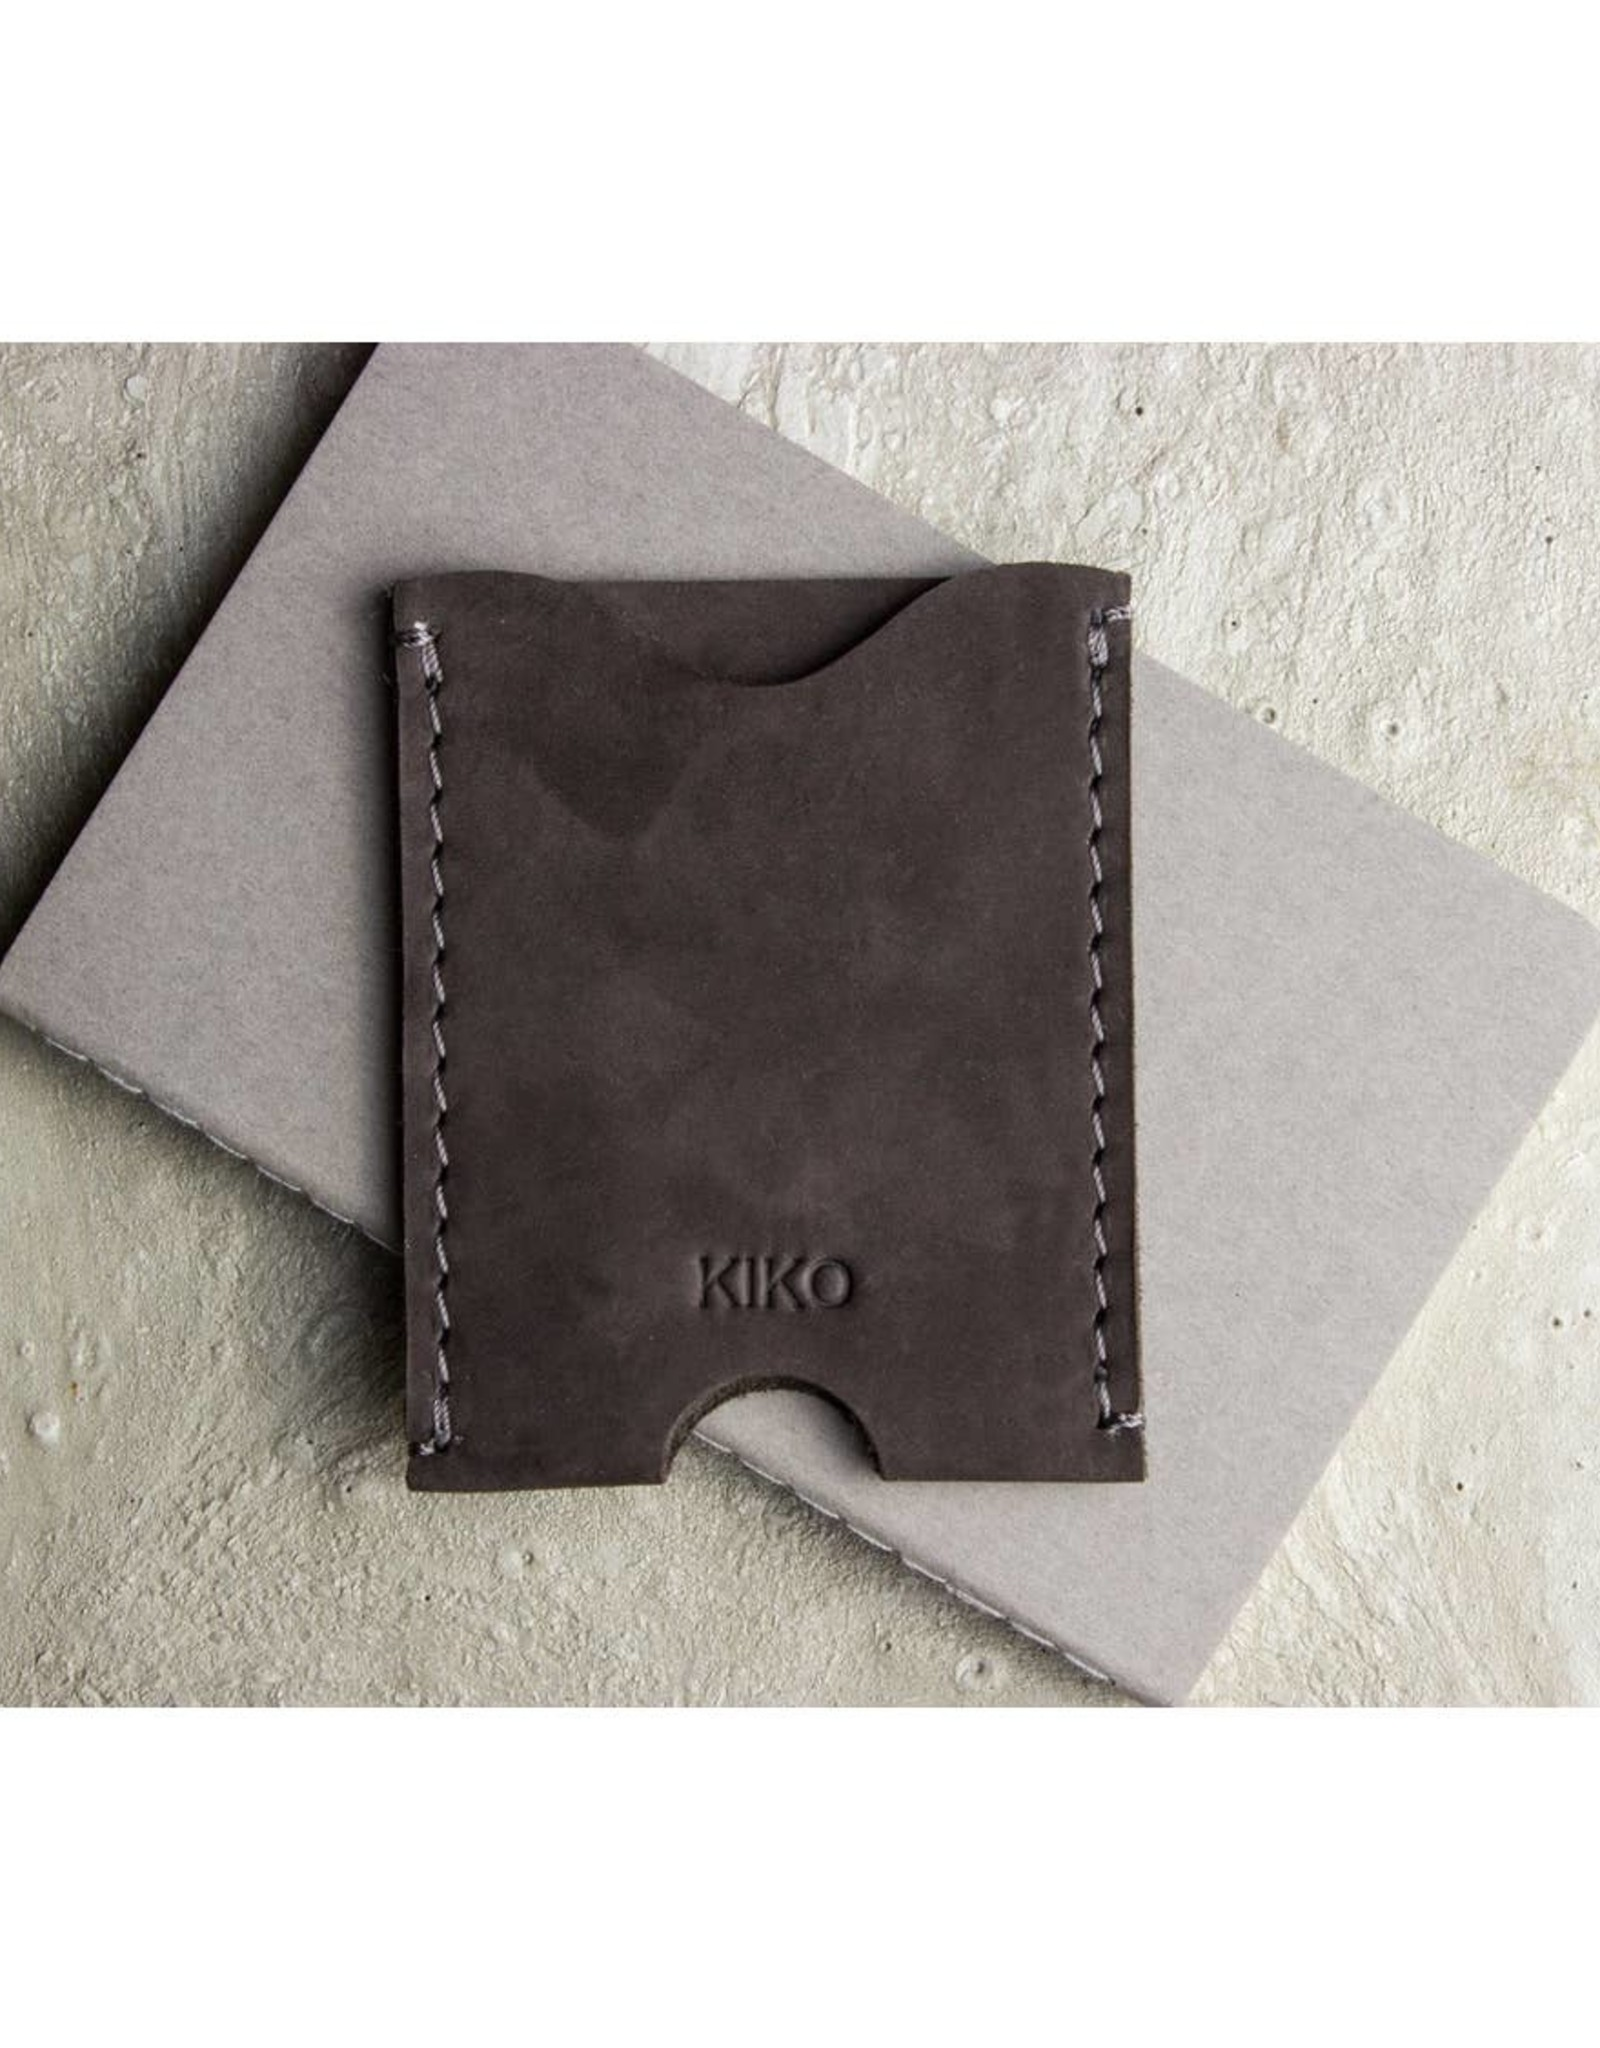 Kiko Leather Kiko Leather | Double Sided Card Case